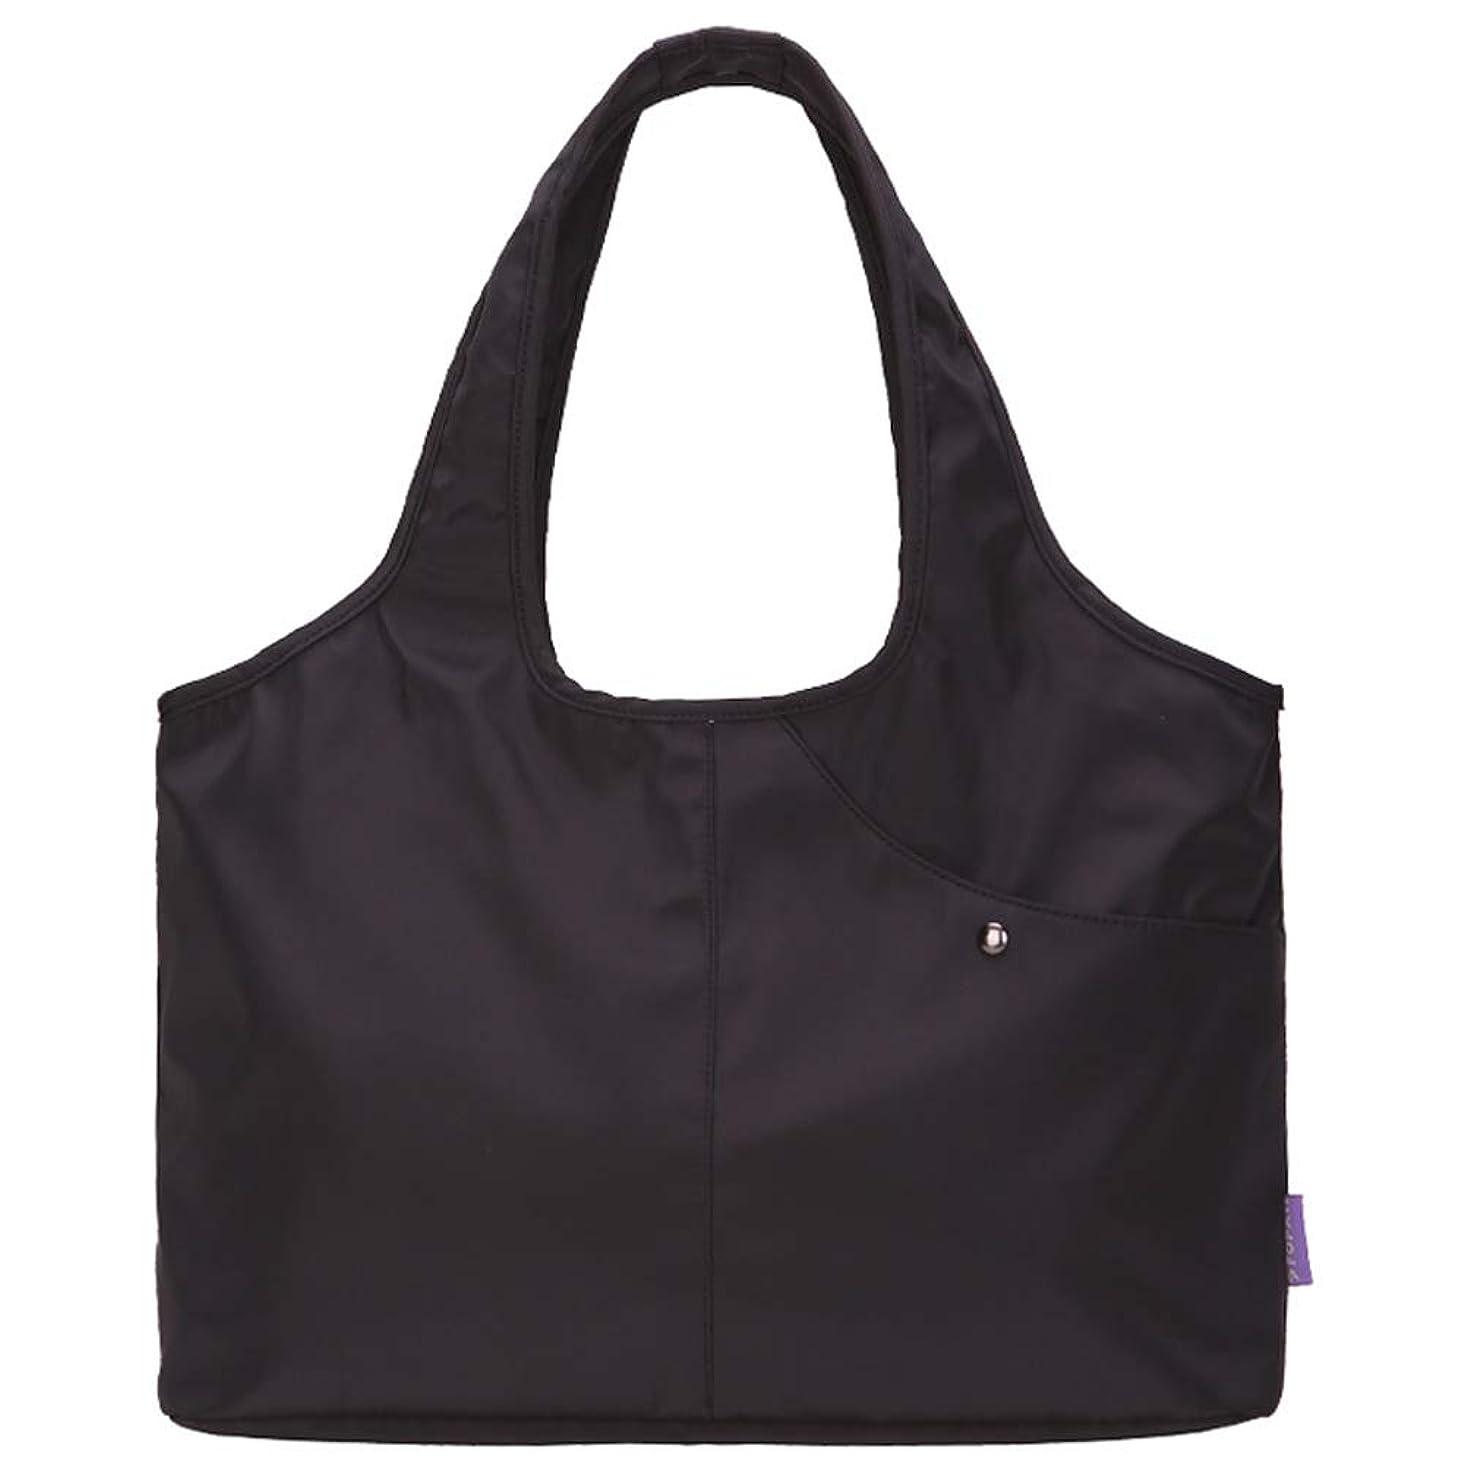 Shoulder Bag for Women, Waterproof Shopping Lightweight Work Purse and Handbag Travel Tote Nylon Large Capacity Hobo